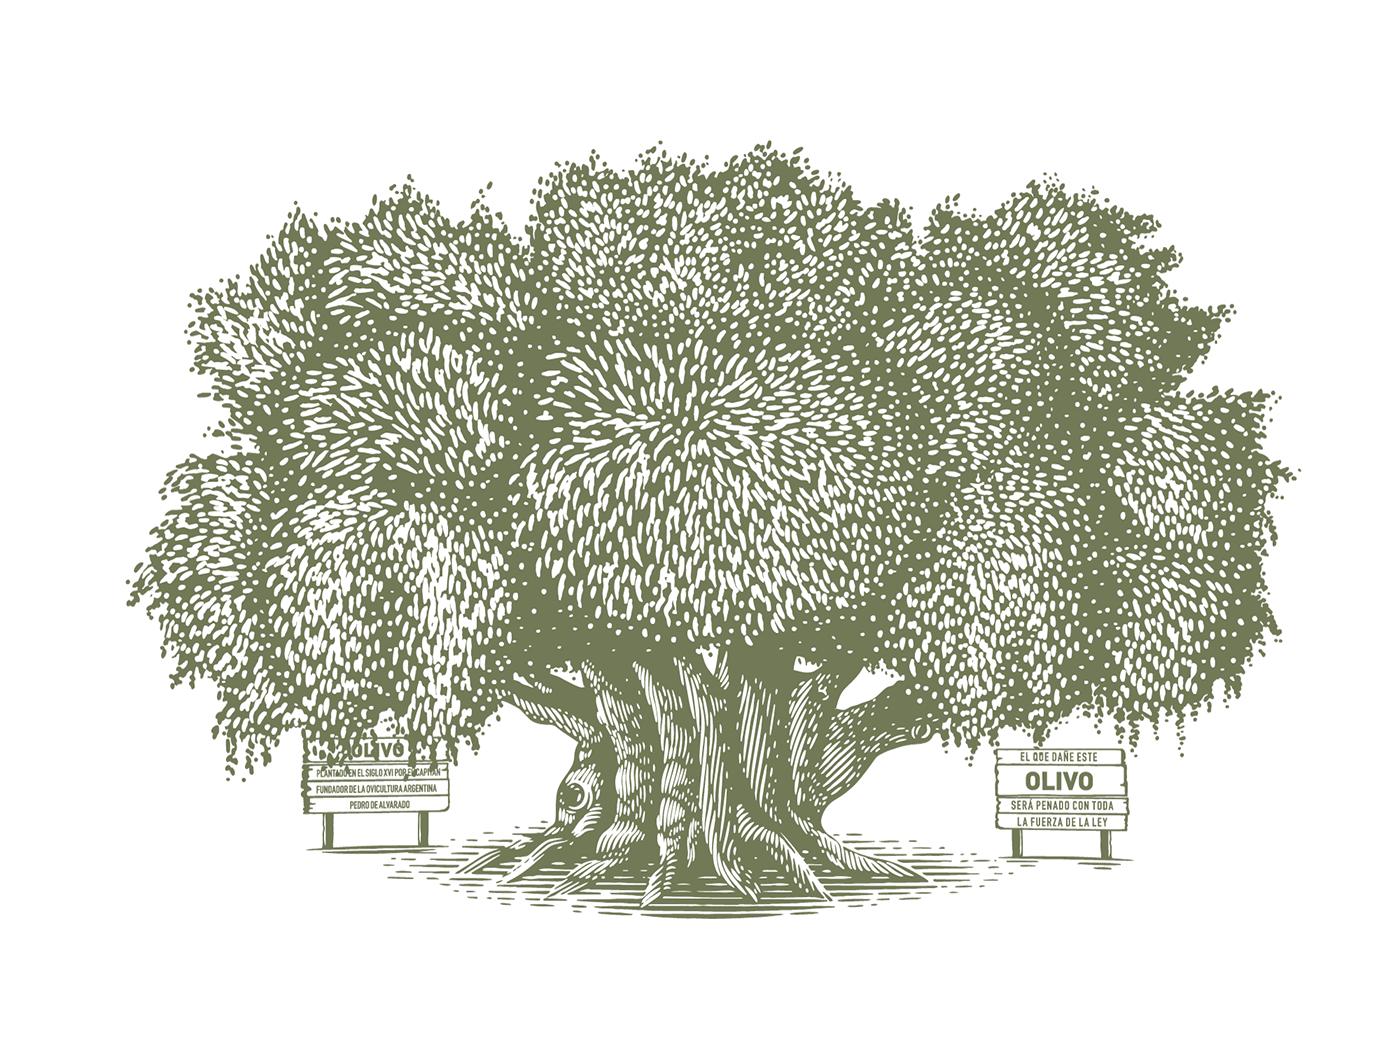 olive olivo   arbol Tree  ILLUSTRATION  ilustracion engraving grabado aceite oil